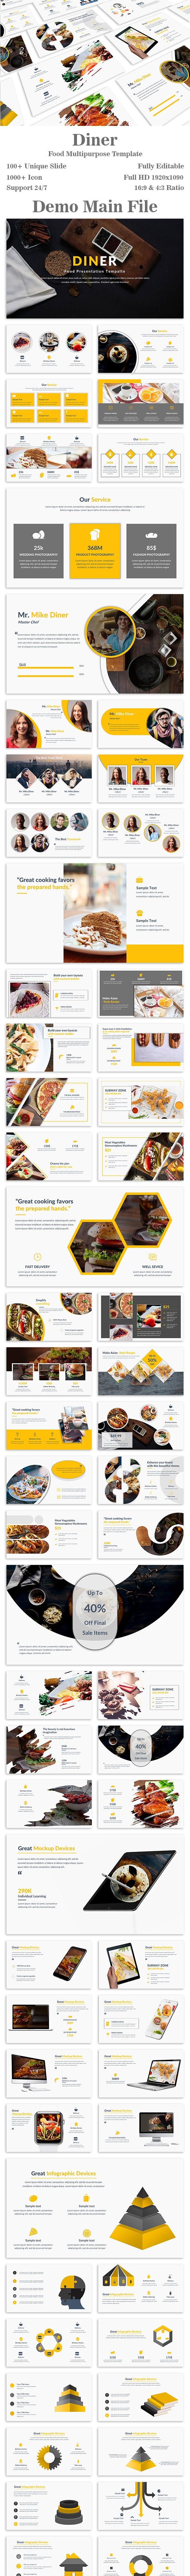 Diner Food Multipupose Keynote Template - Creative Keynote Templates